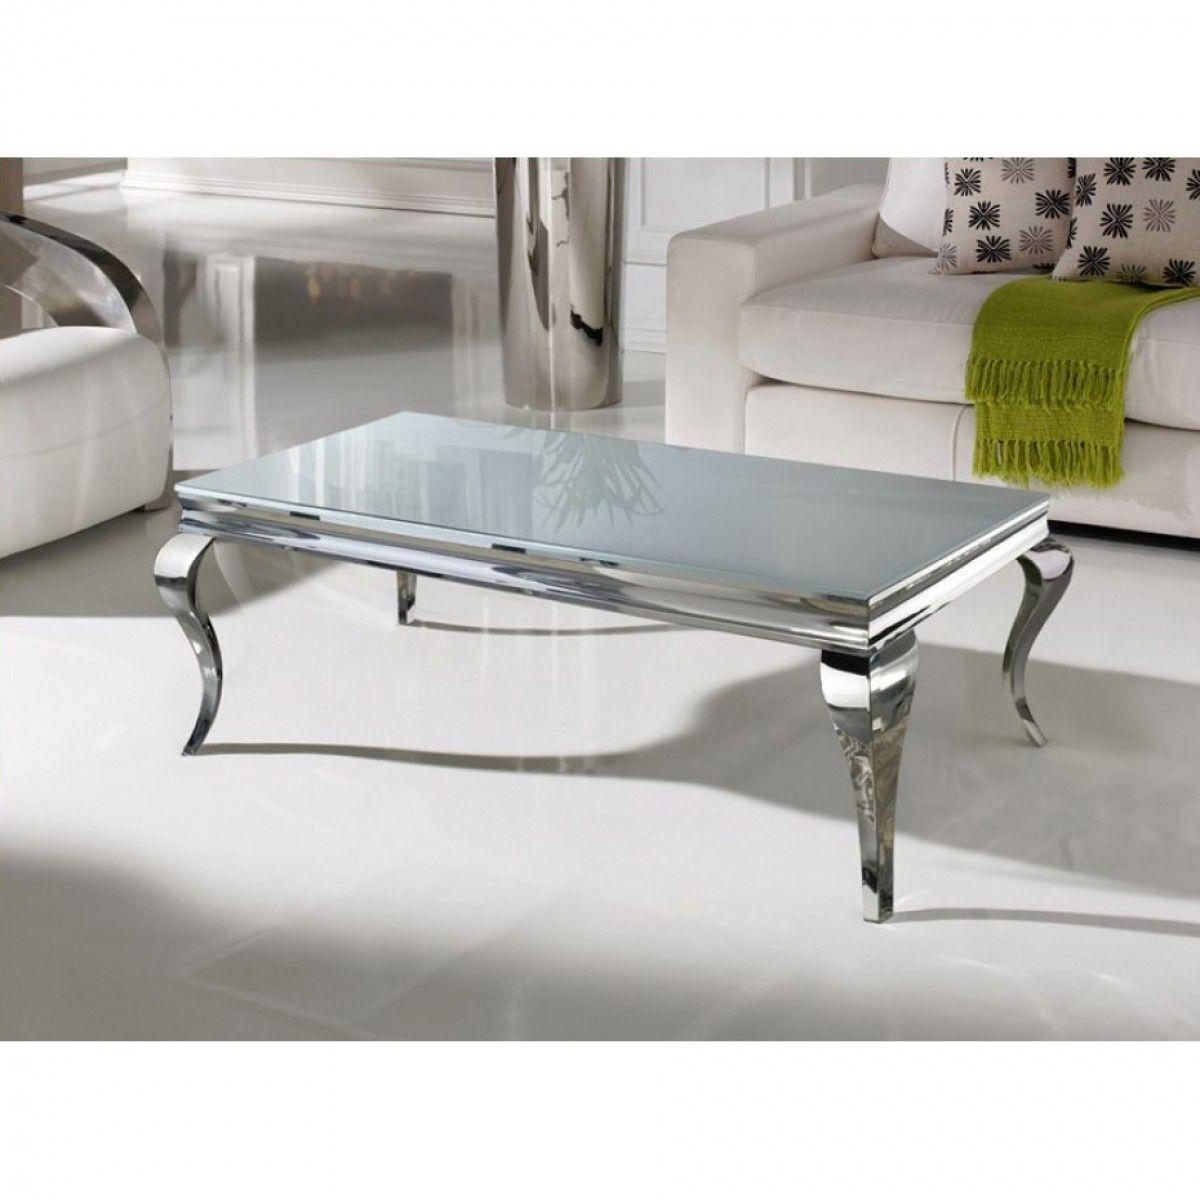 Table basse plateau imitation marbre